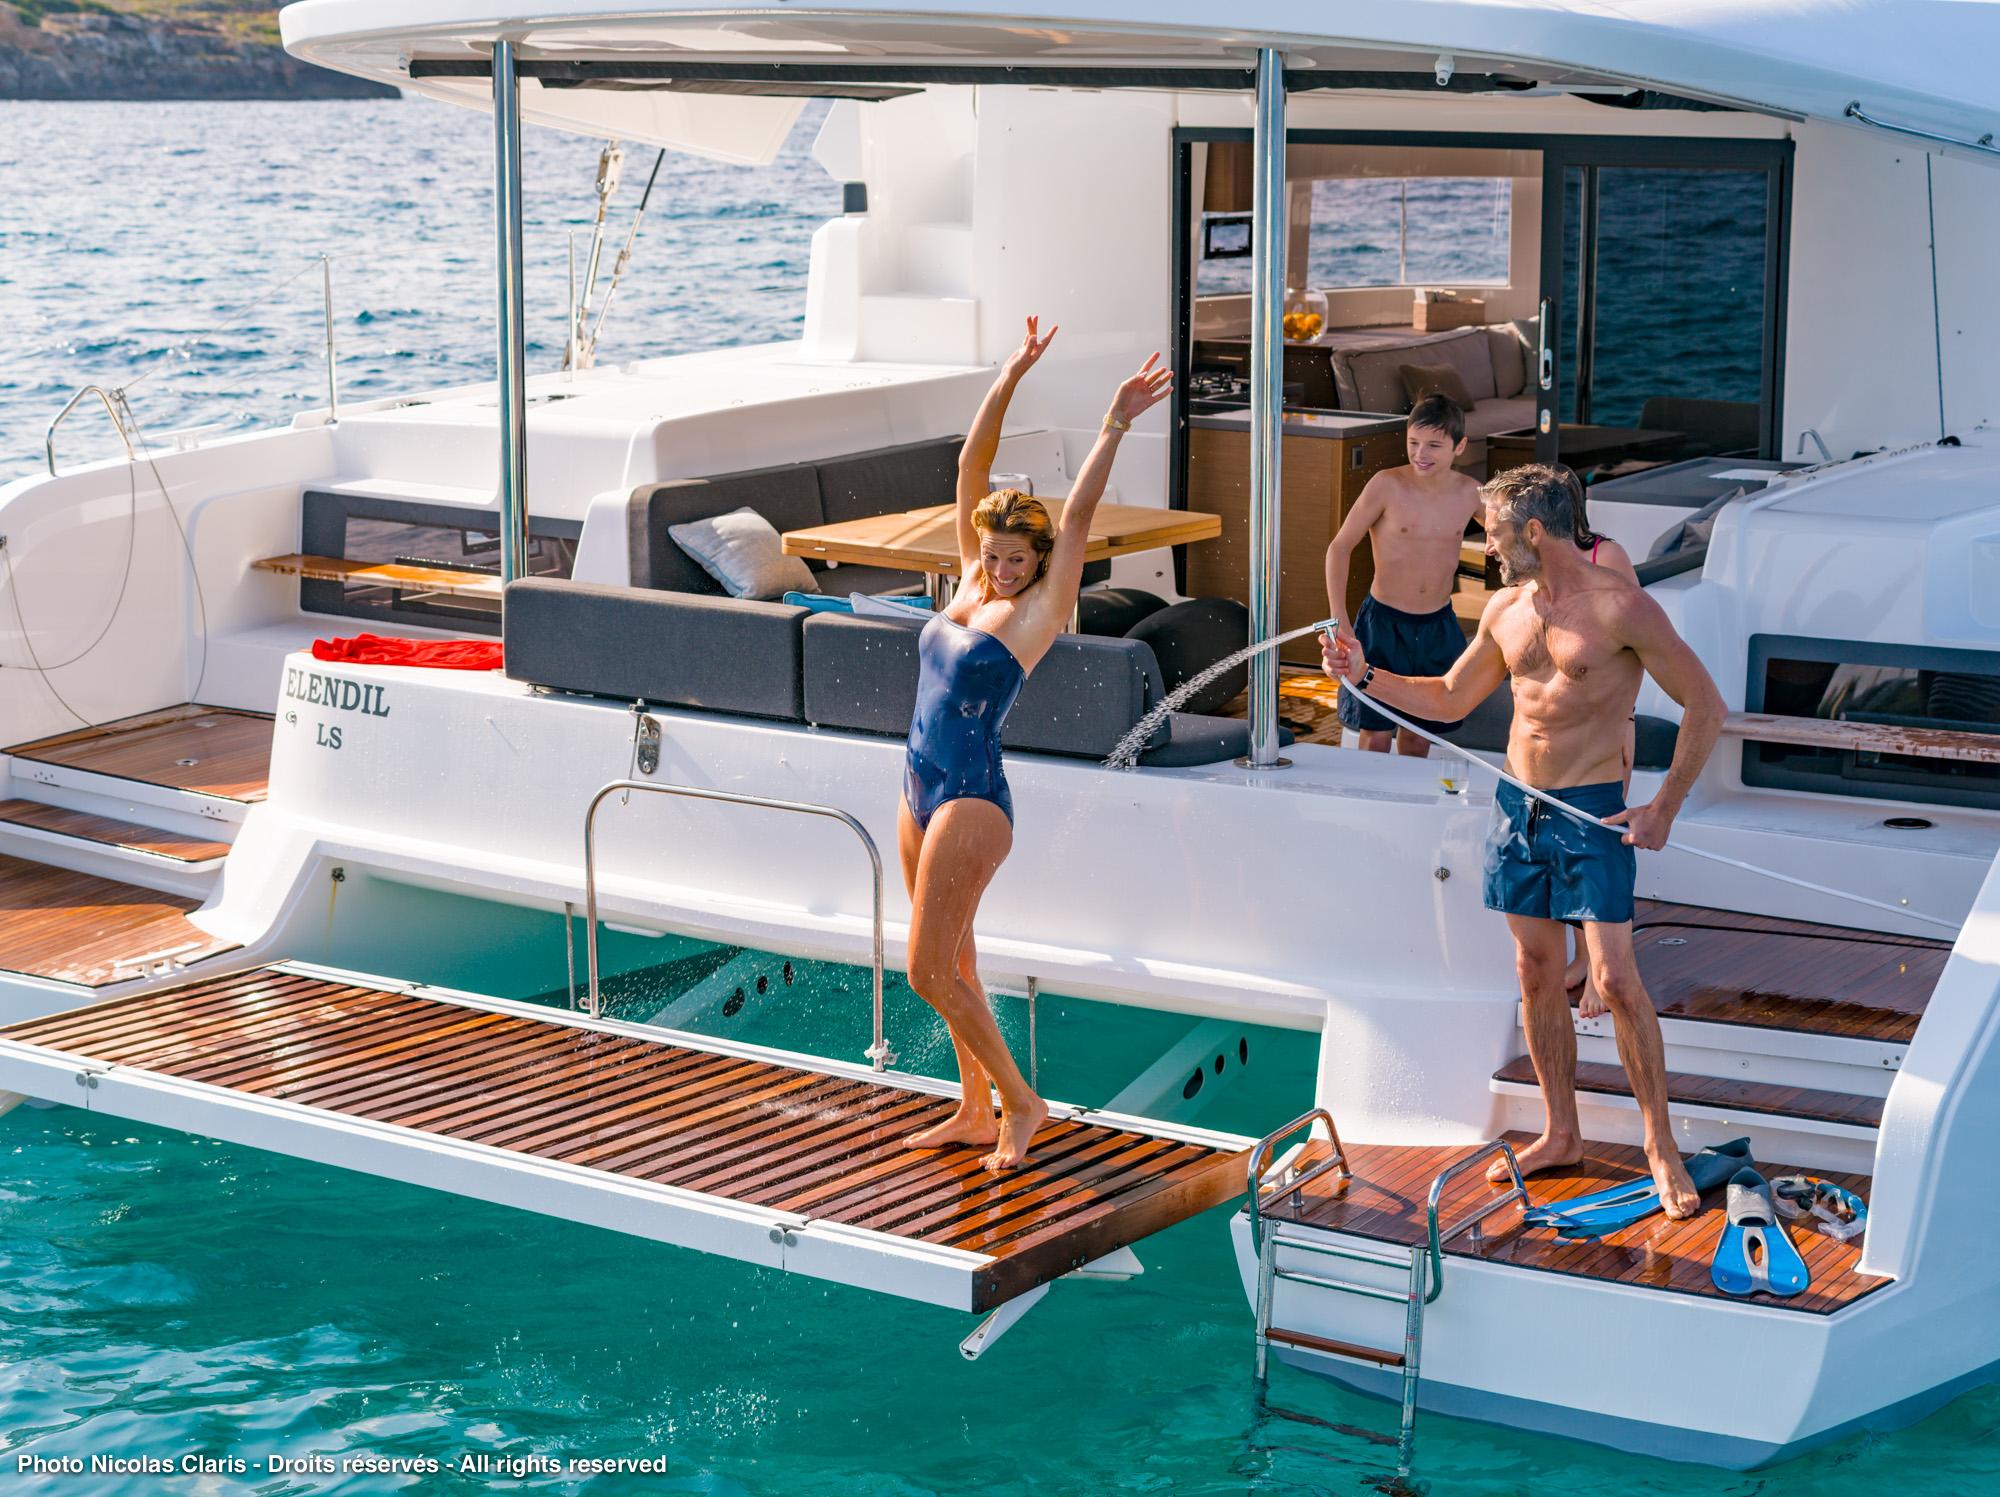 Lifestyle – On deck